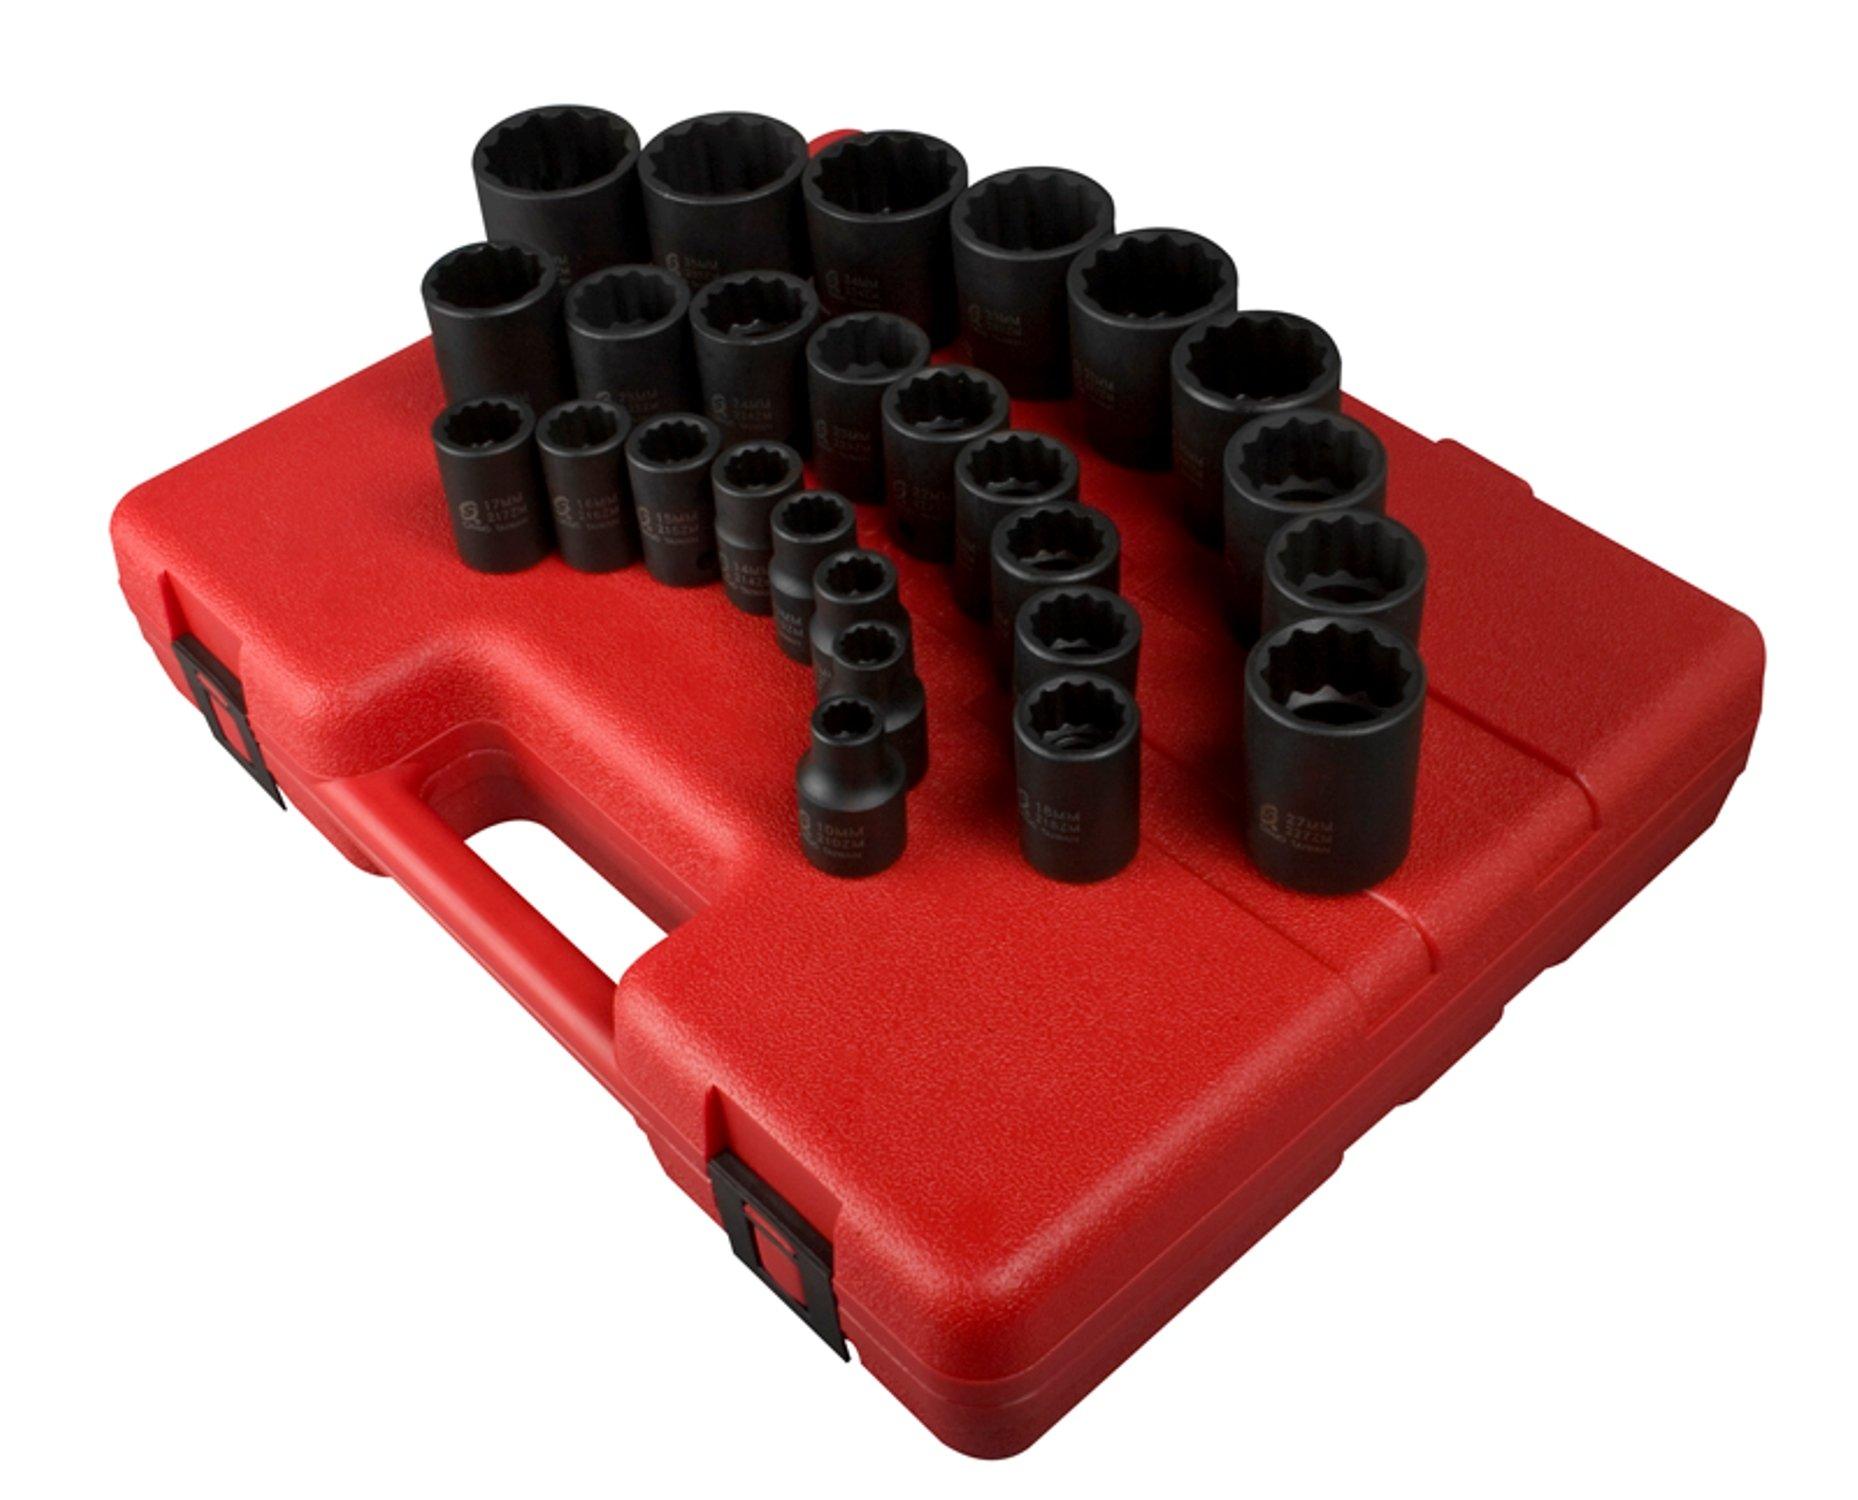 Sunex 2826 1/2-Inch Drive 12-Point Metric Impact Socket Set, 26-Piece